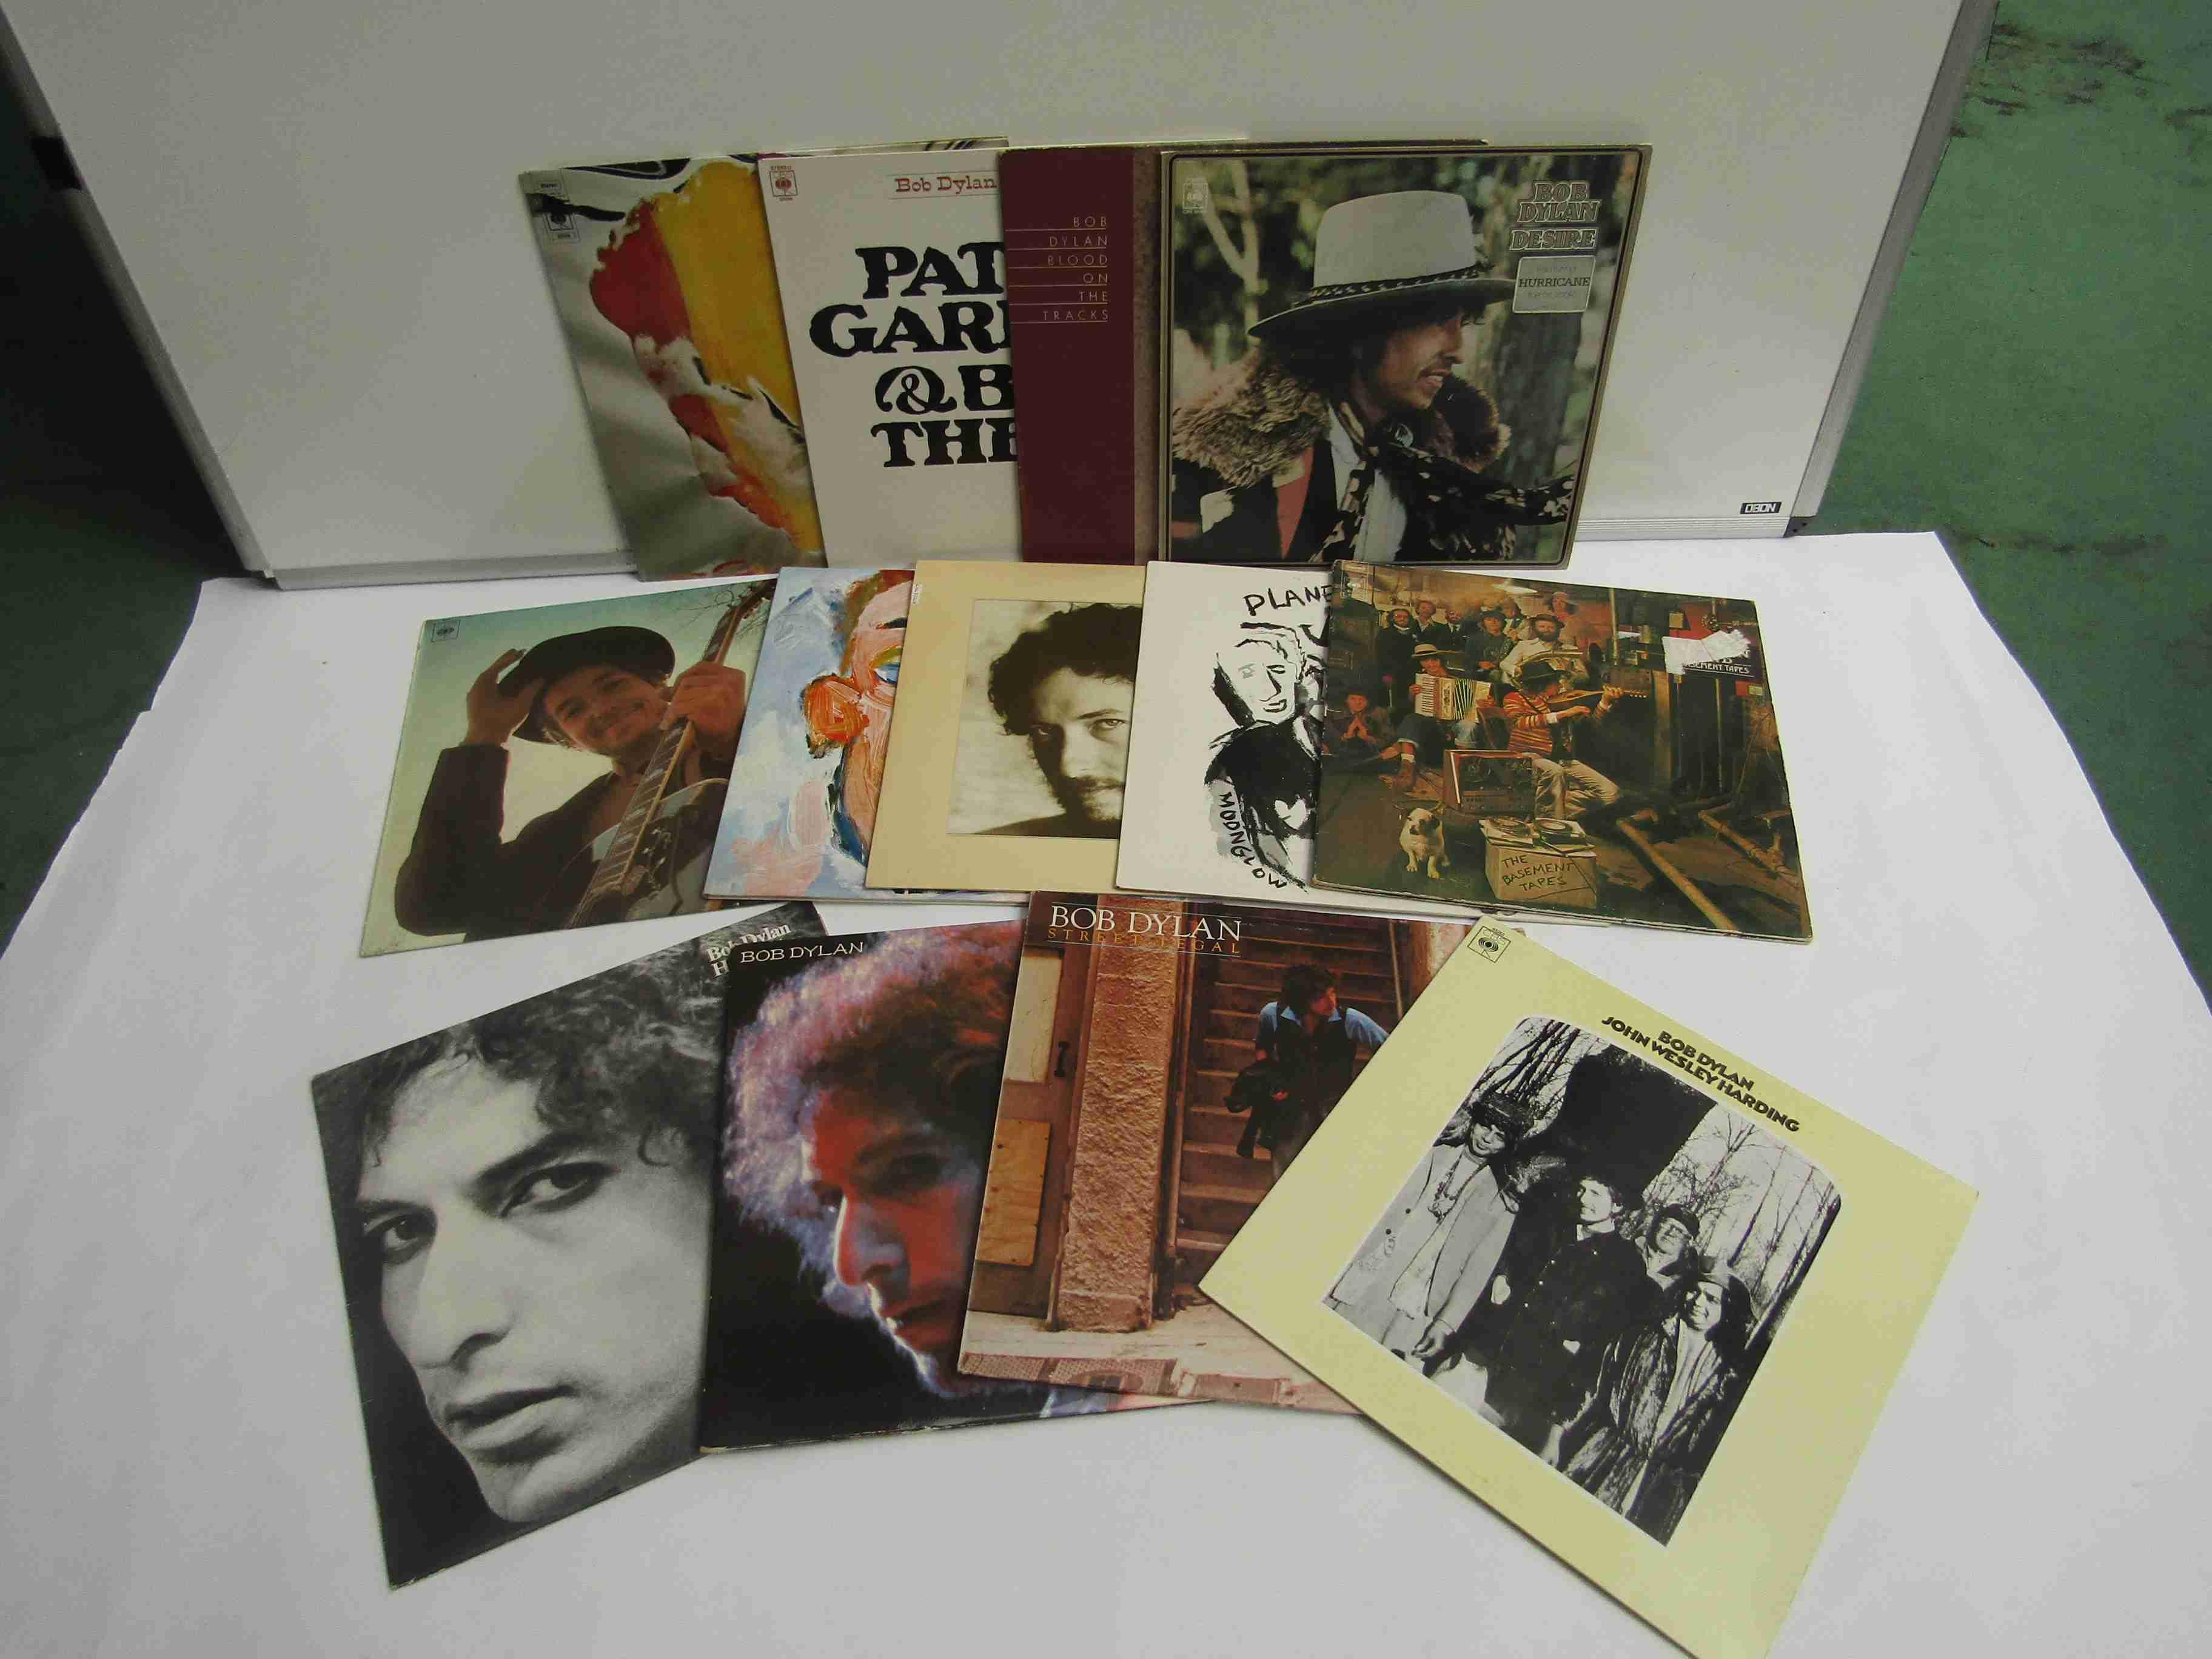 BOB DYLAN: Thirteen LP's to include 'John Wesley Harding', 'Nashville Skyline', 'Self Portrait',